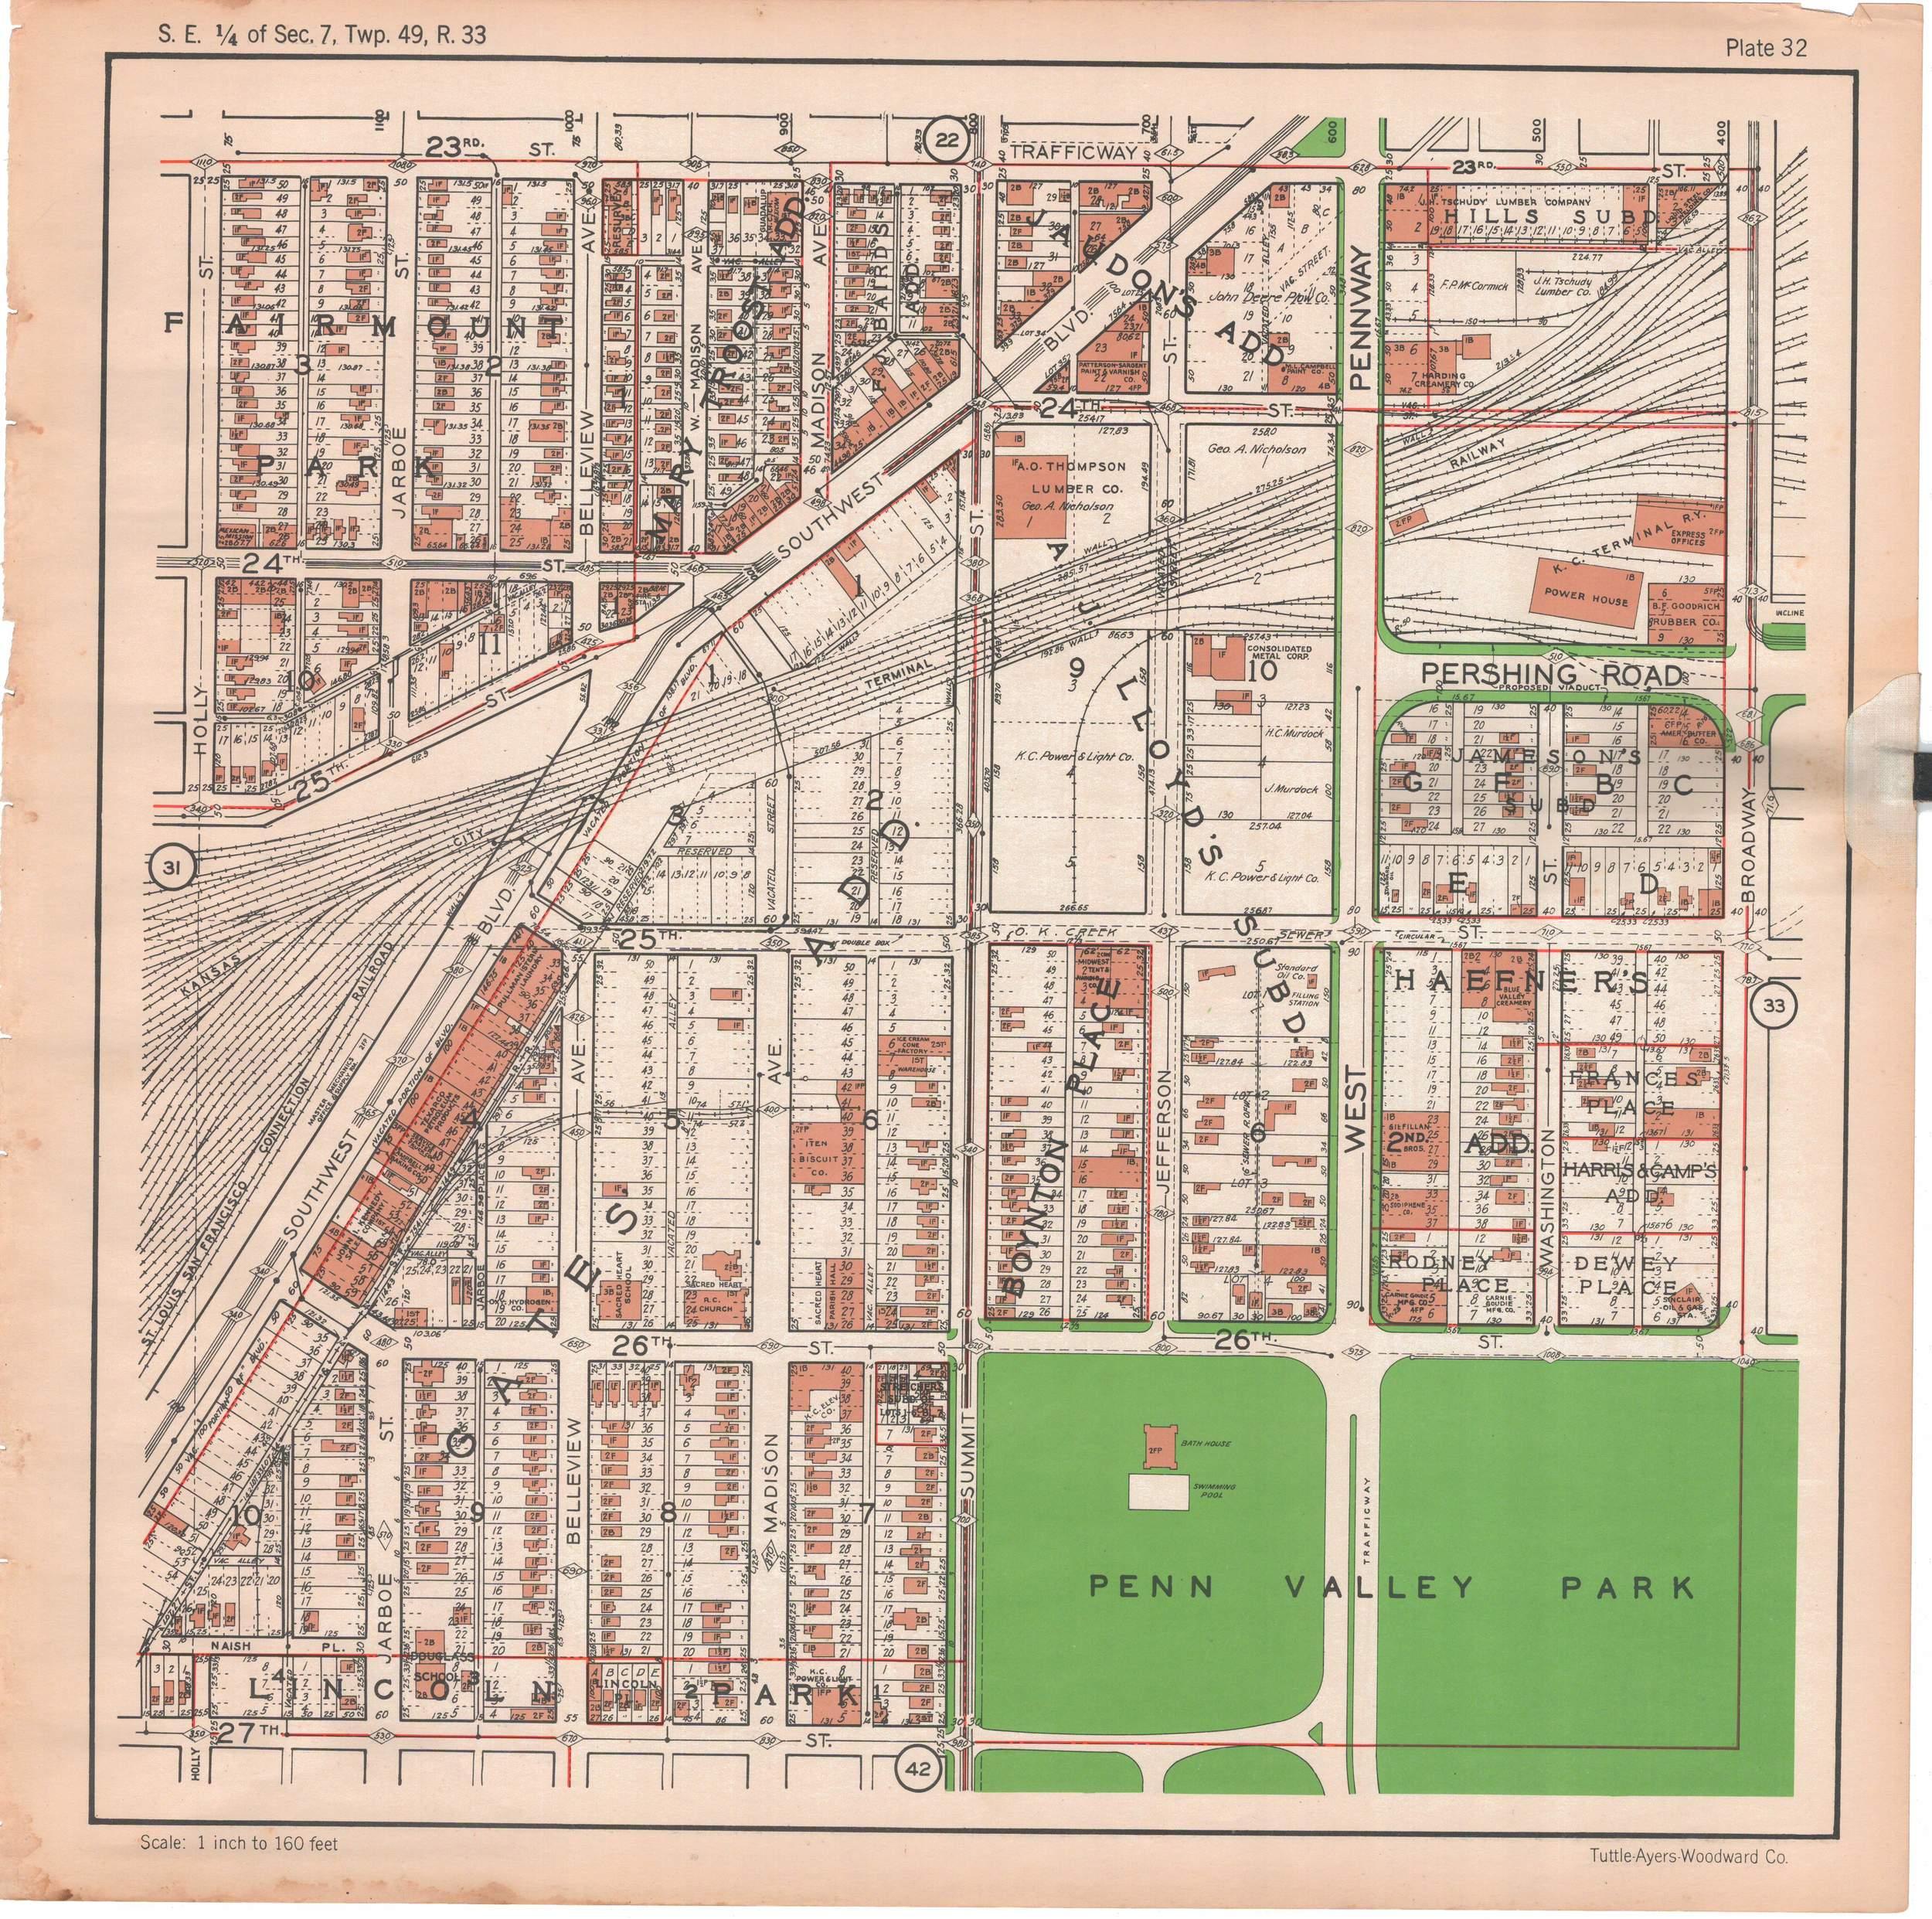 1925 TUTTLE_AYERS_Plate 32.JPG